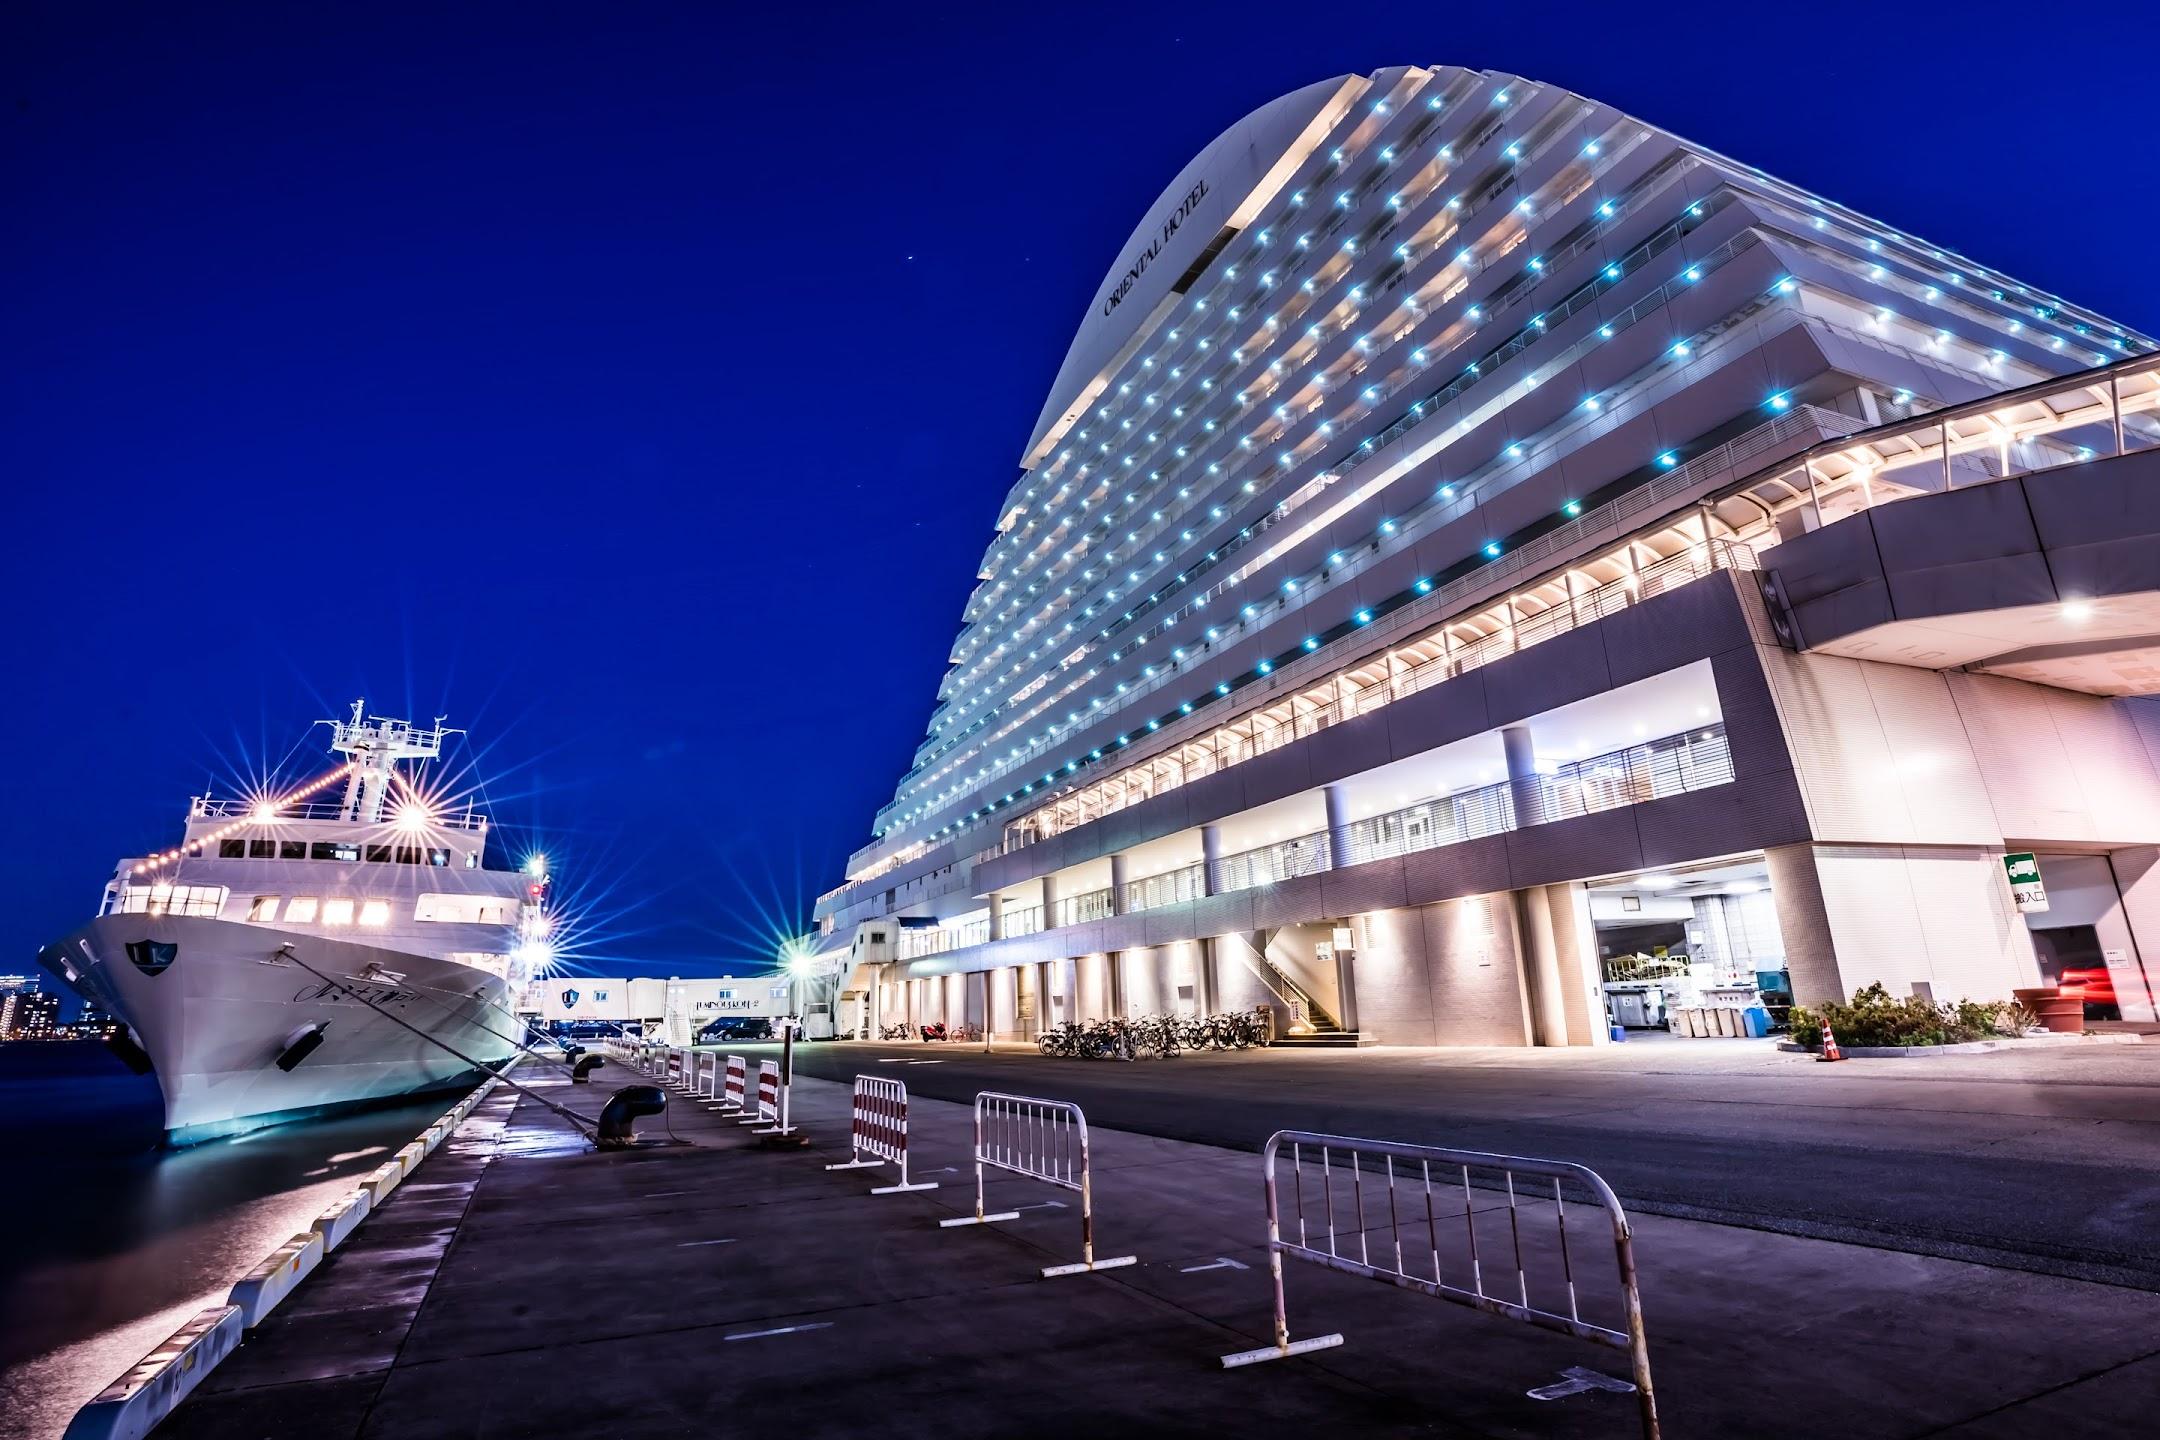 Kobe uminous Kobe 2 Kobe Meriken Park Oriental Hotel night view